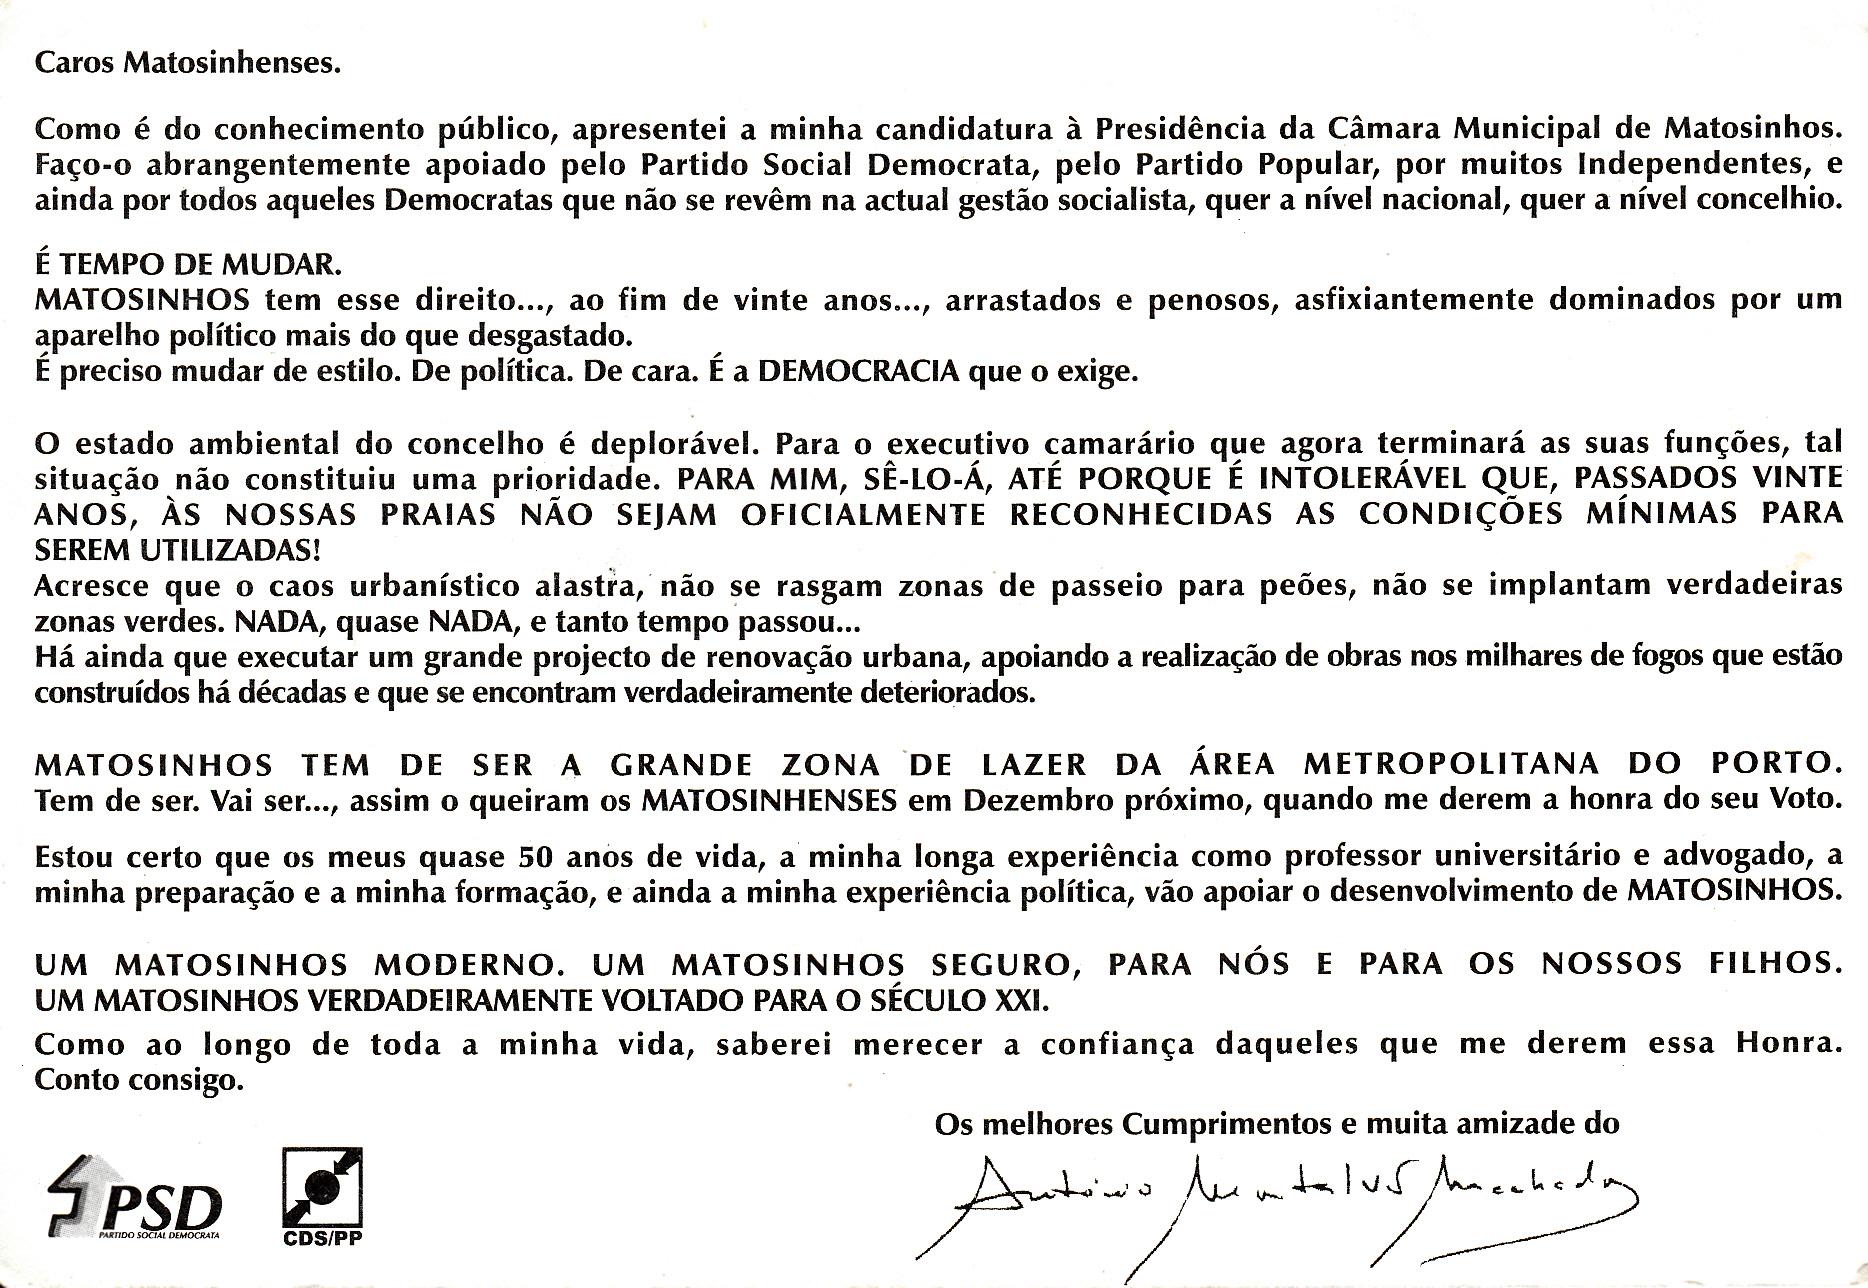 PSD_2001_Matosinhos_0002